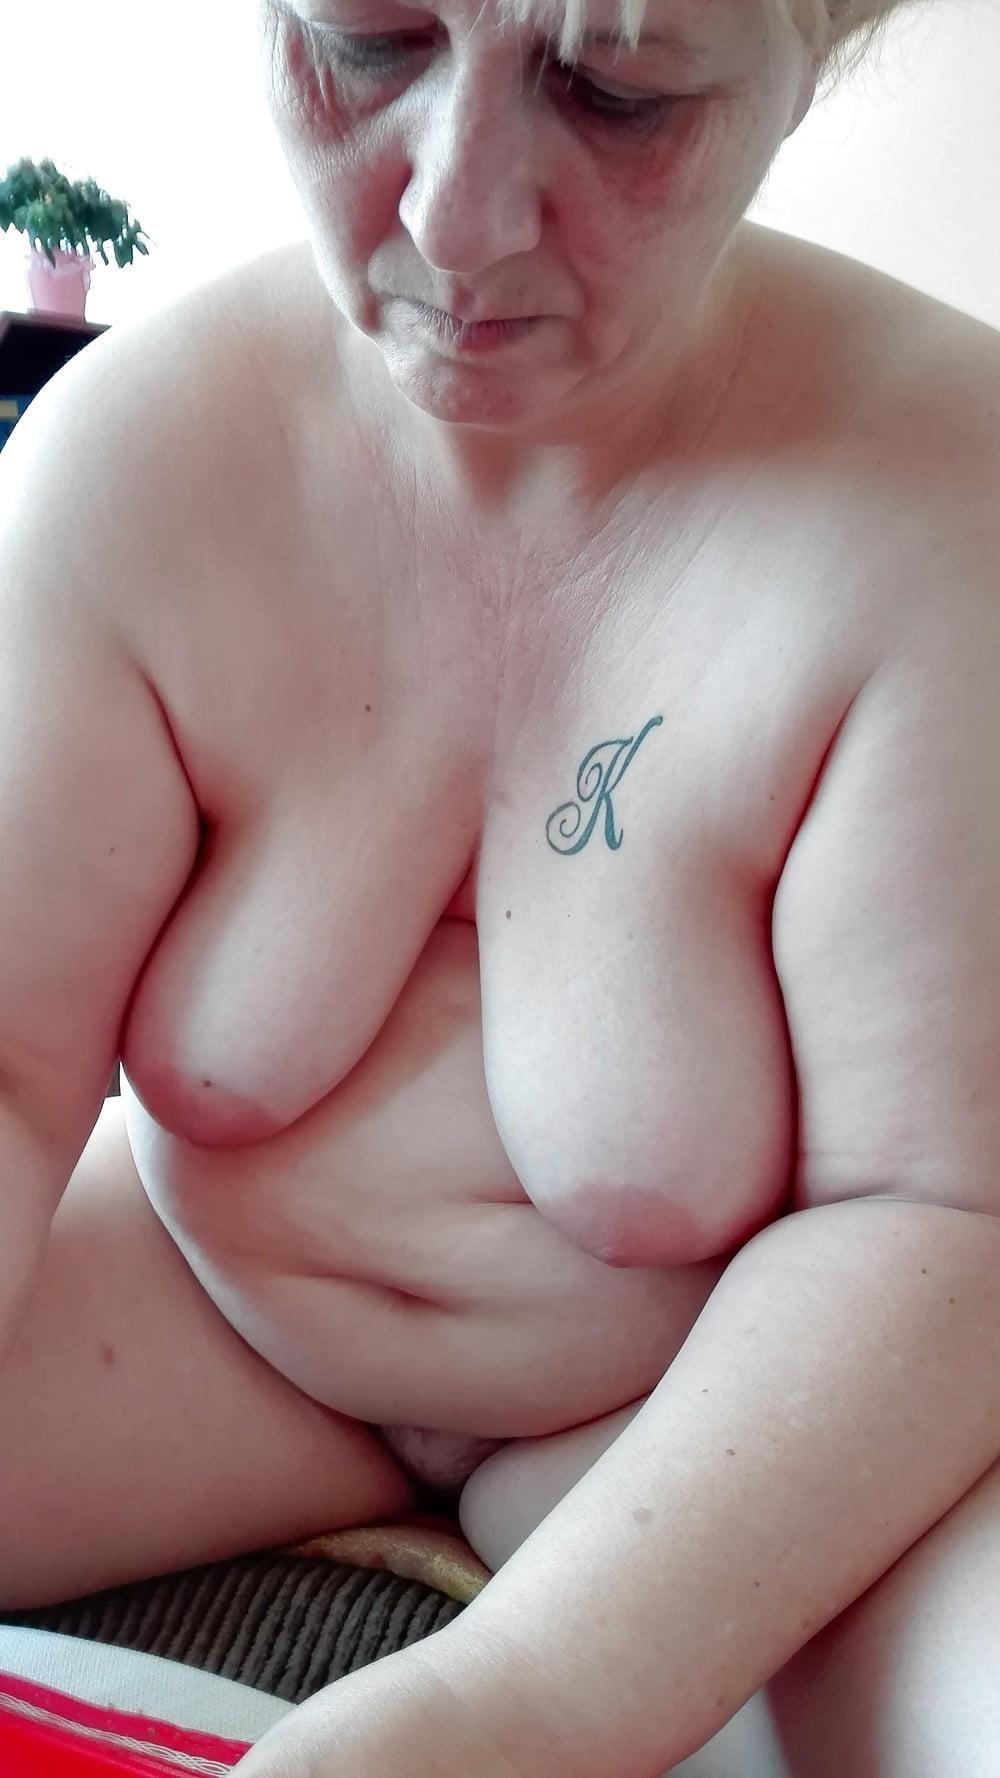 Big tits creampie pics-6809